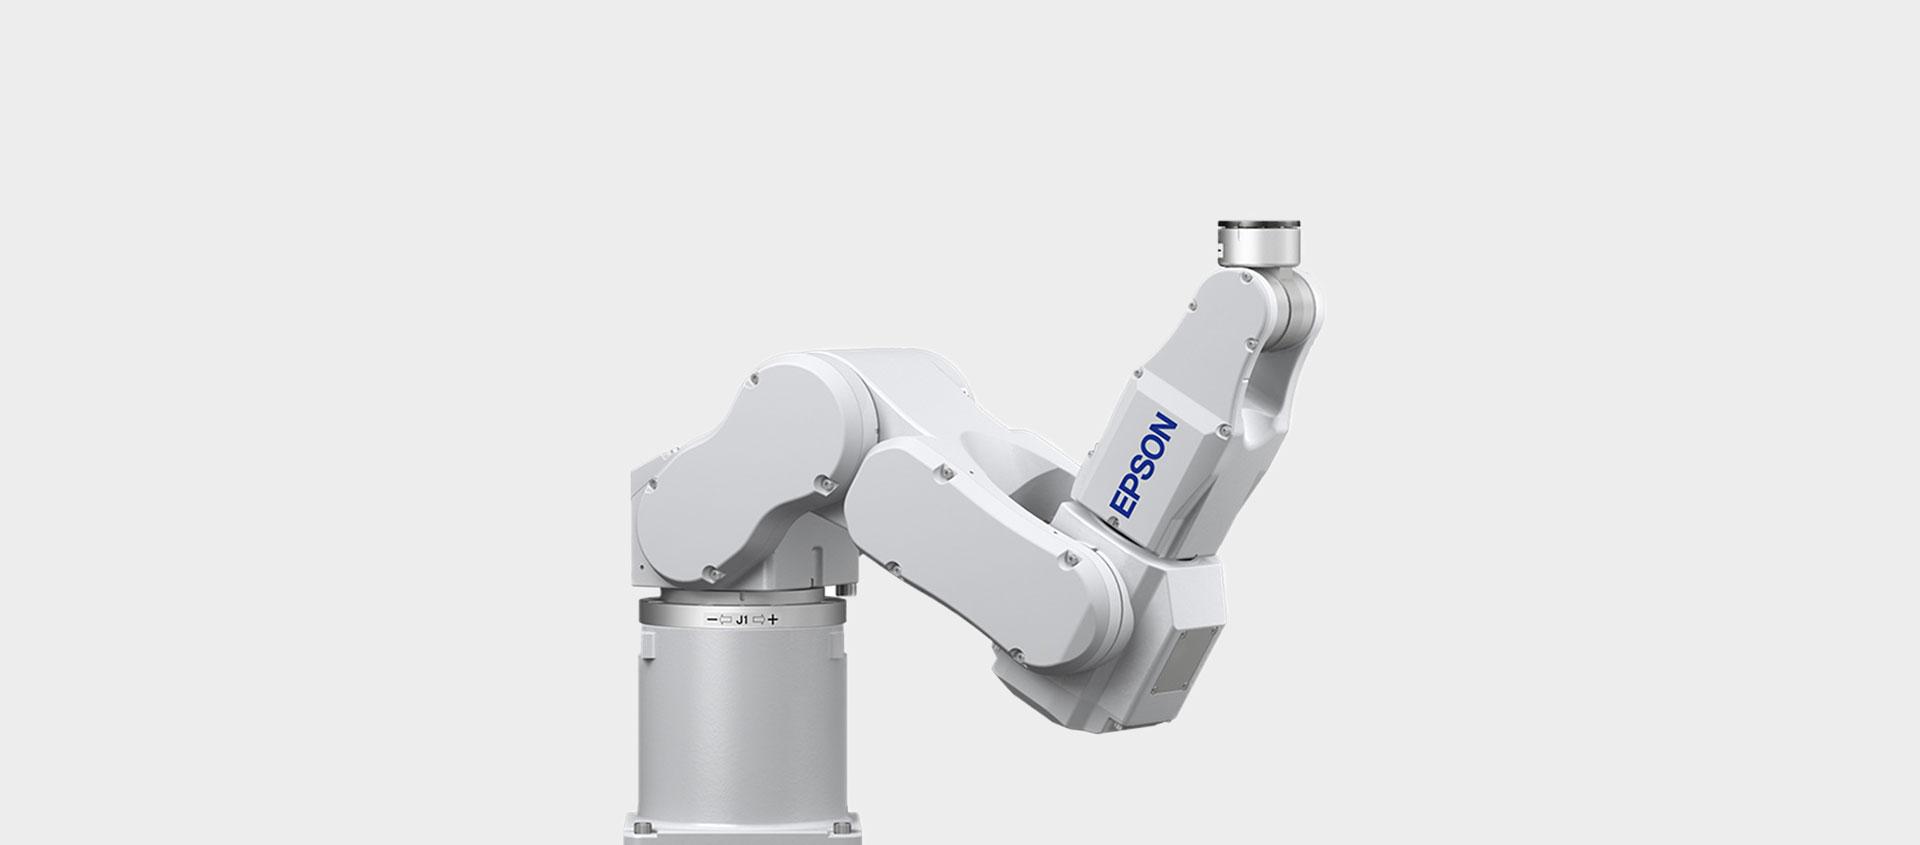 Epson Industrial Robots